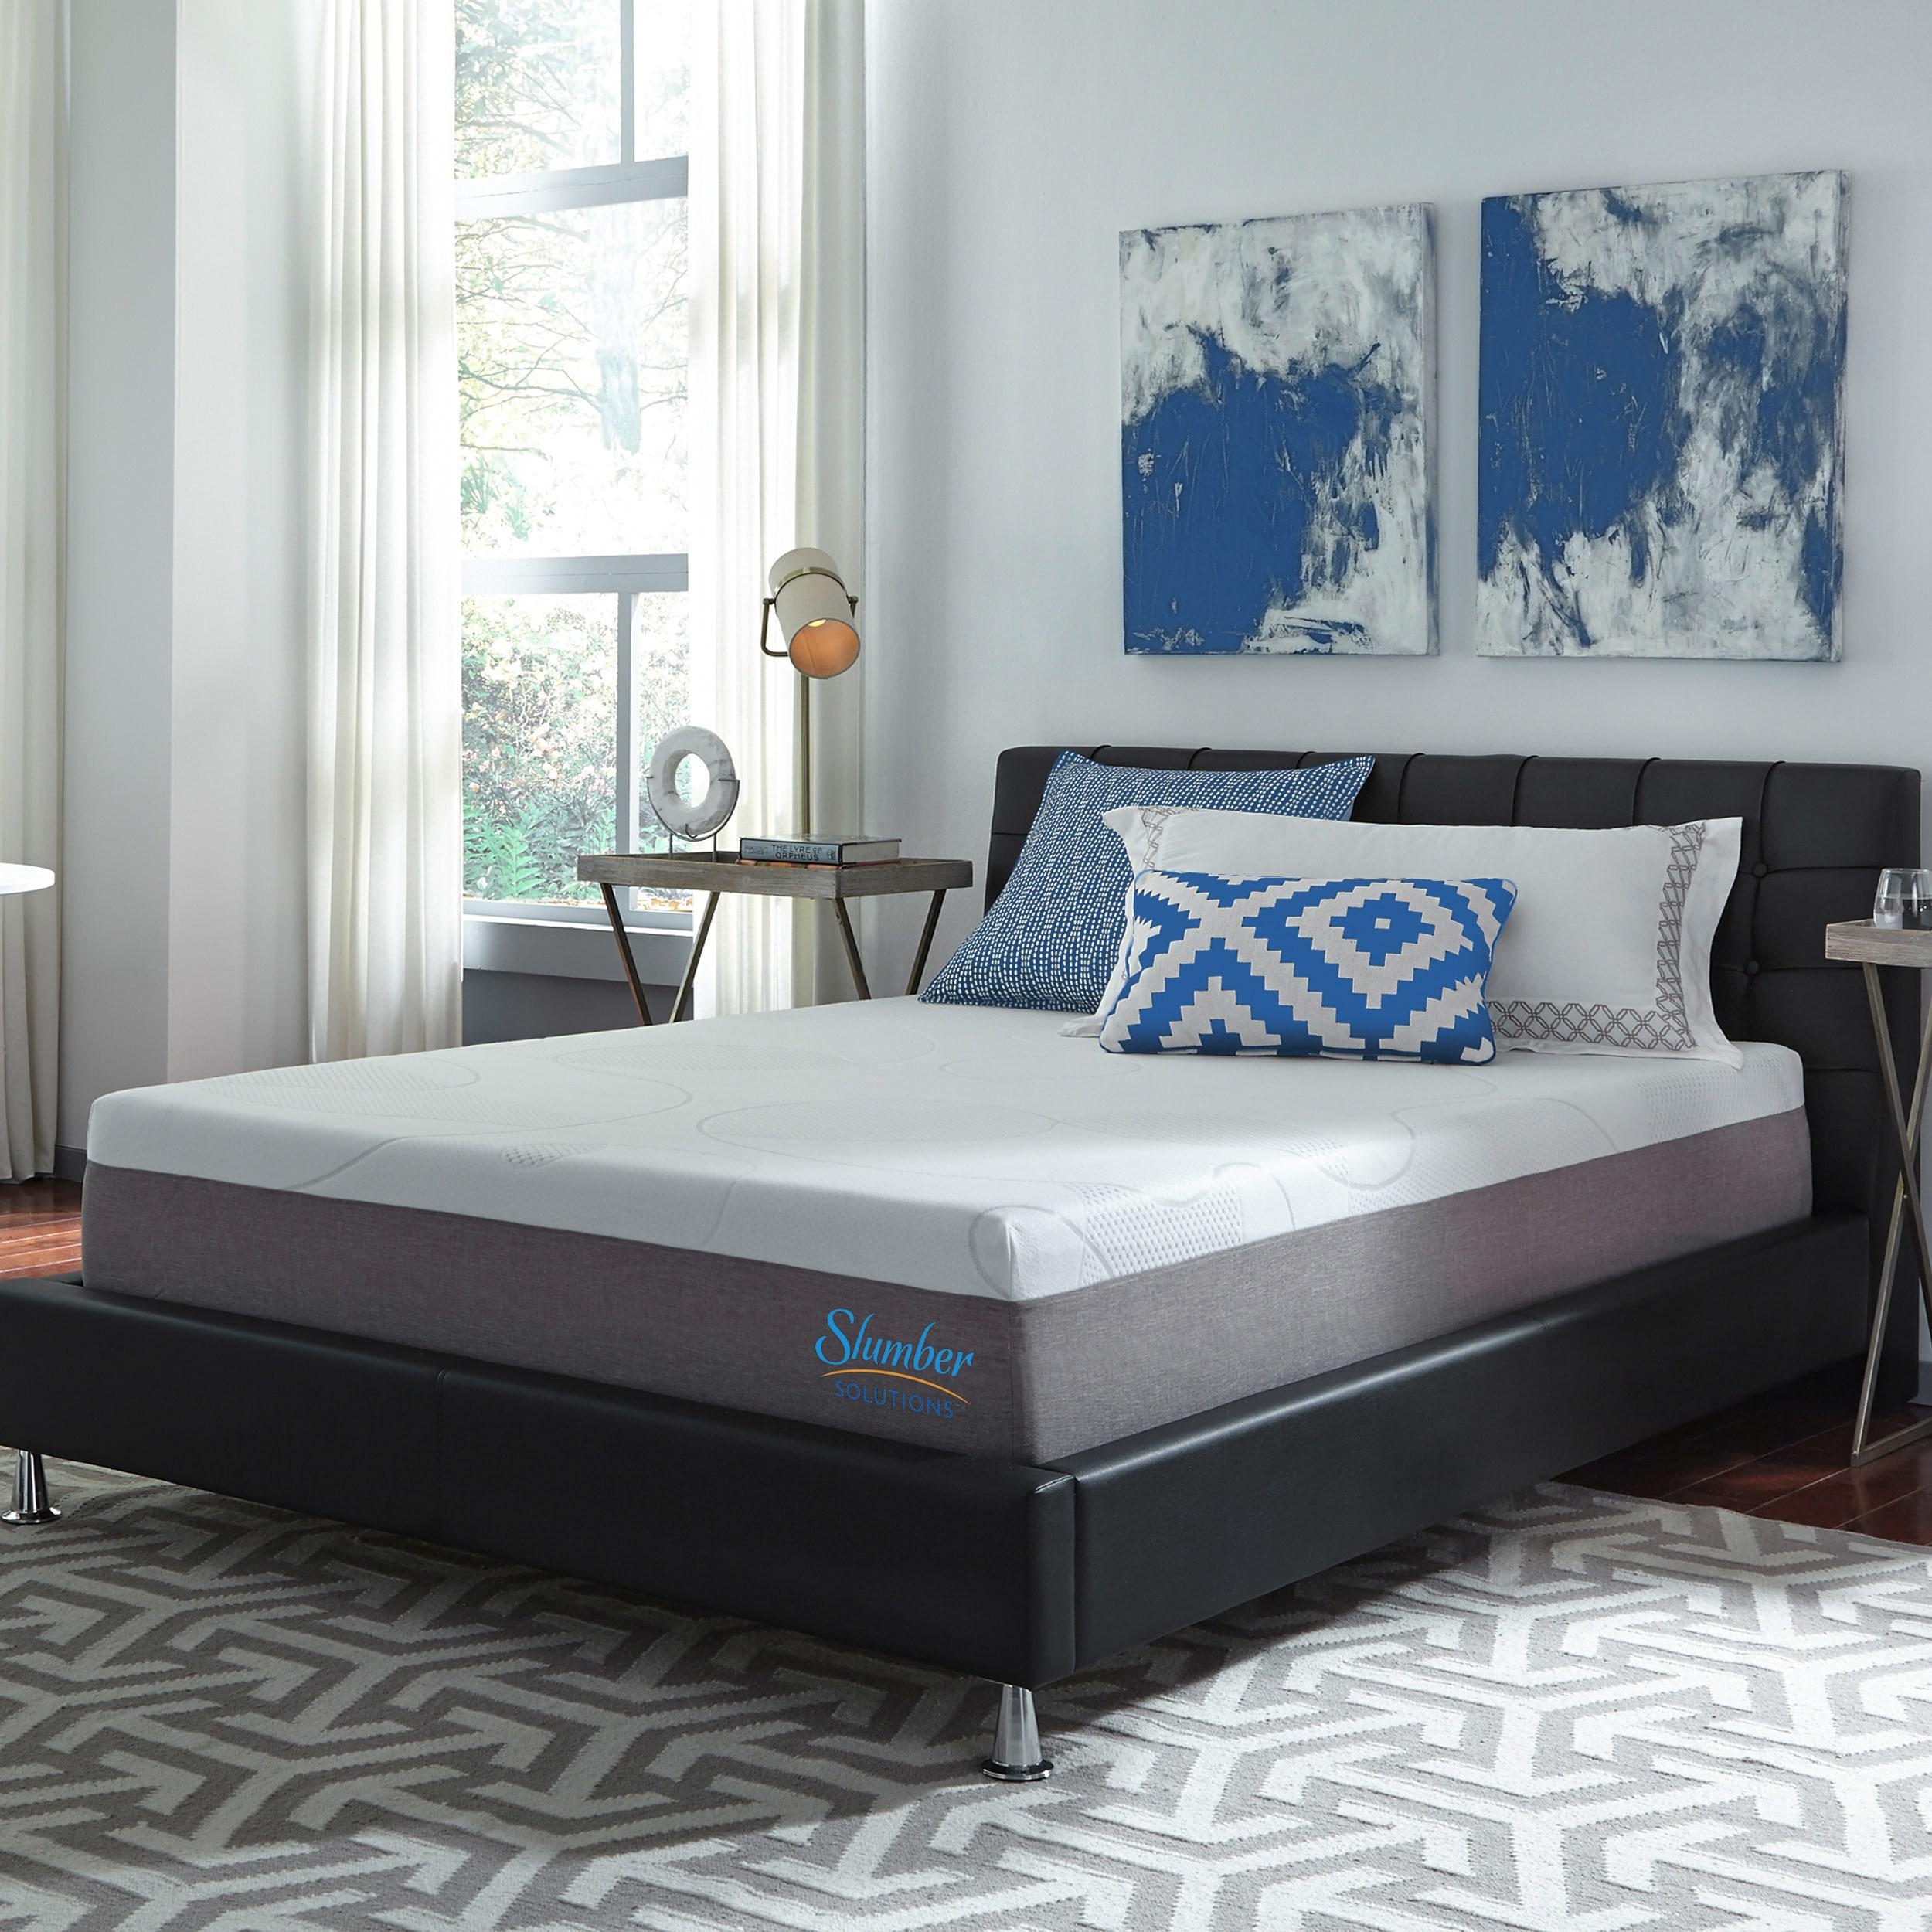 Shop Slumber Solutions Choose Your Comfort 12 Inch Gel Memory Foam